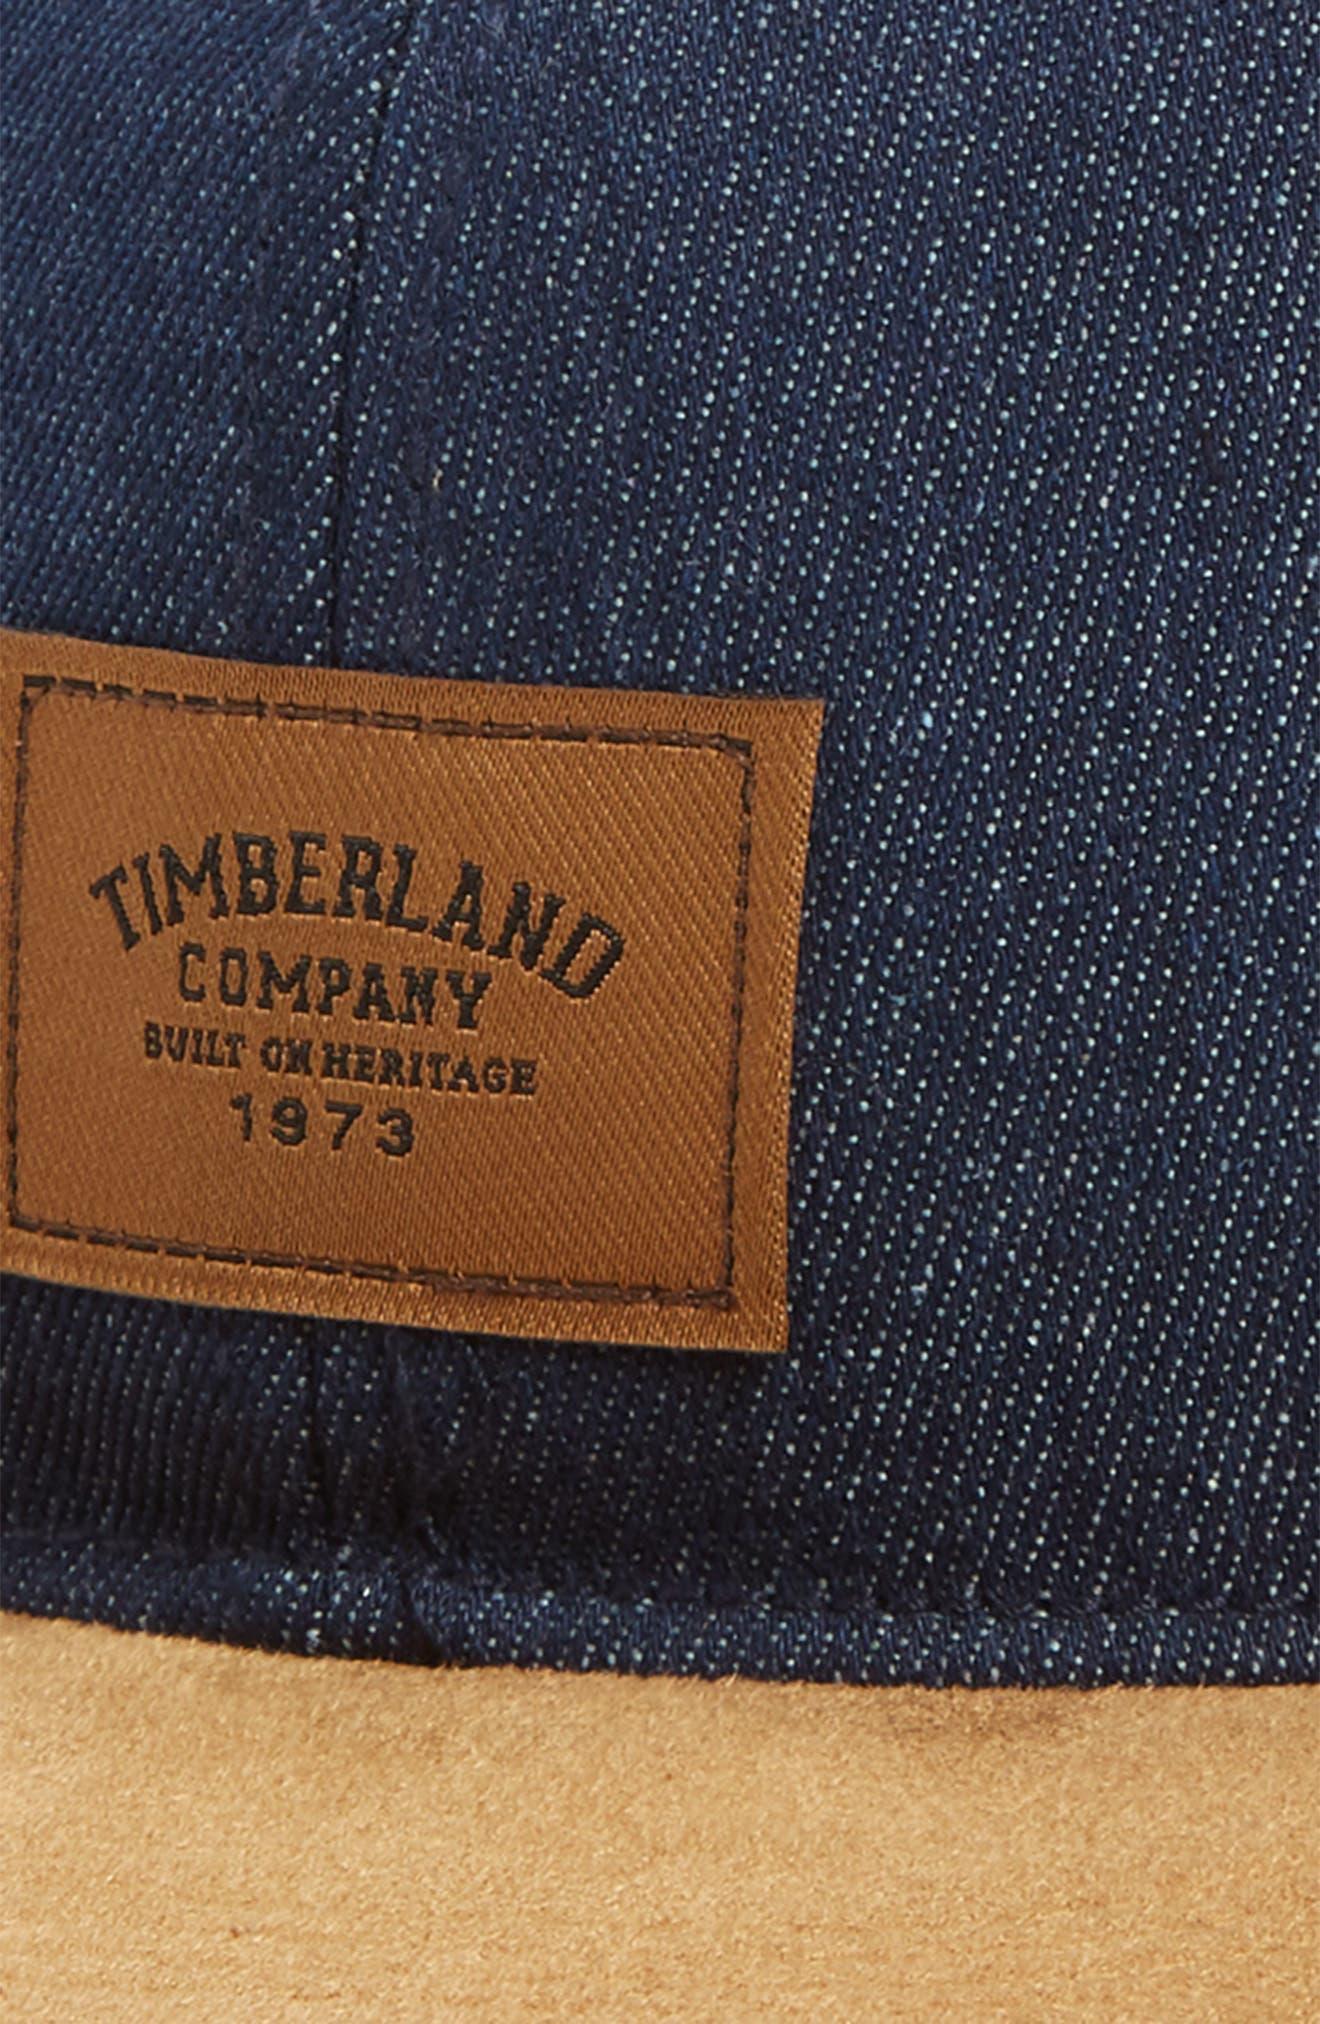 TIMBERLAND, Tilton Logo Baseball Cap, Alternate thumbnail 3, color, DARK DENIM